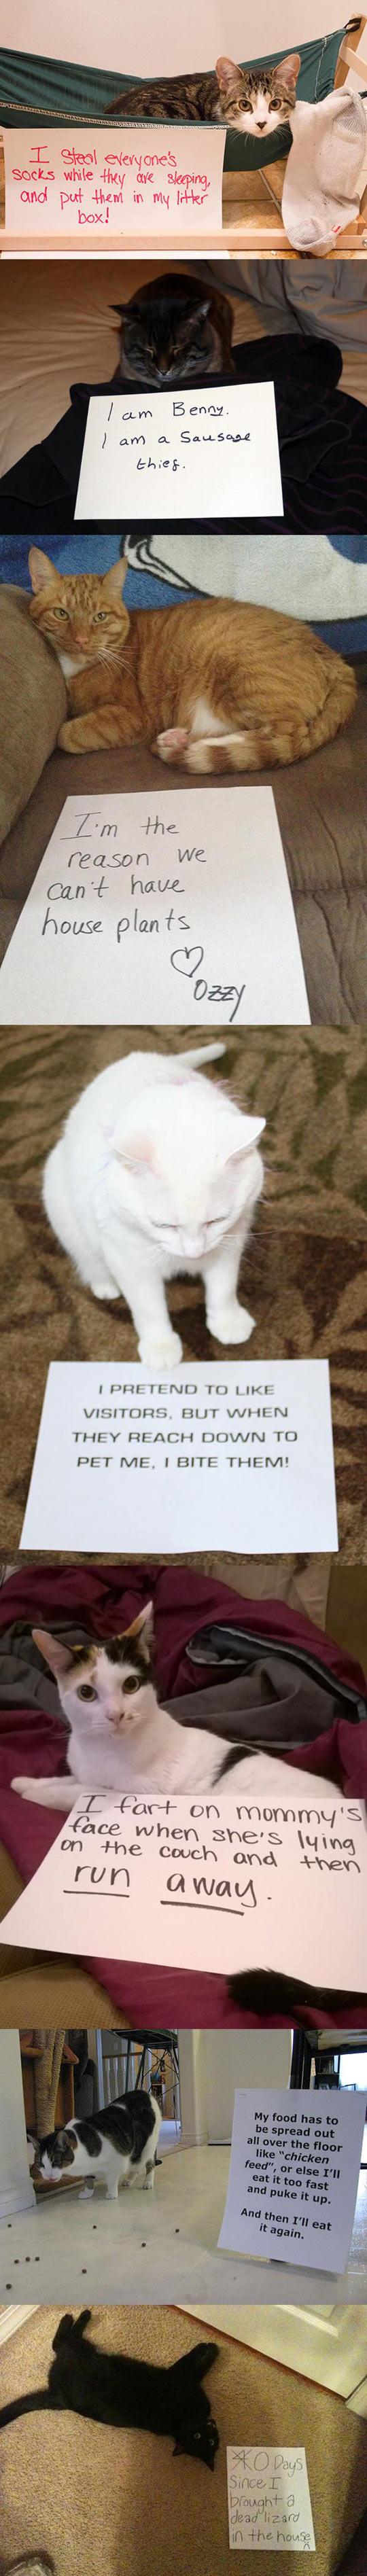 funny-cat-shaming-signs-cute-lizard